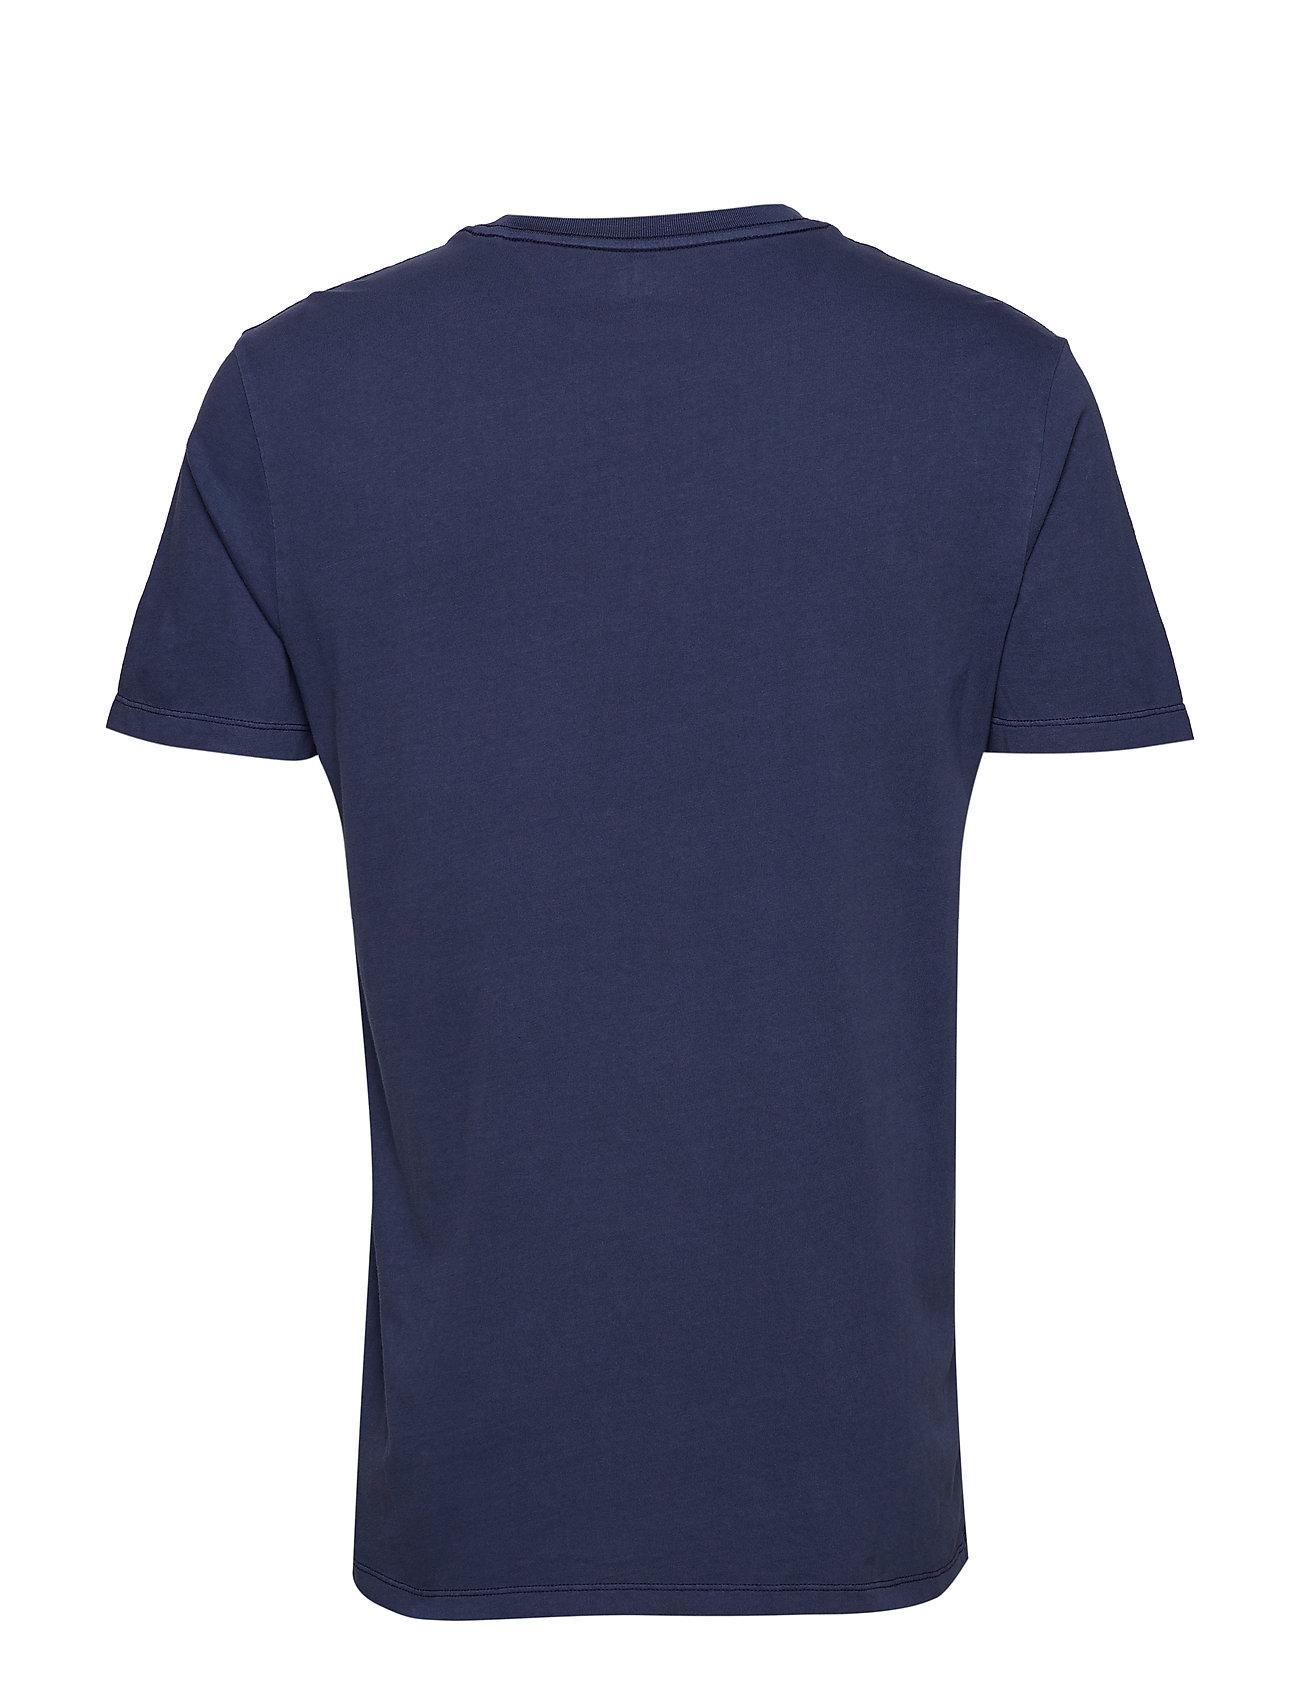 GAP Gap 50th Anniversary Vintage Wash Pocket T-Shirt - TAPESTRY NAVY